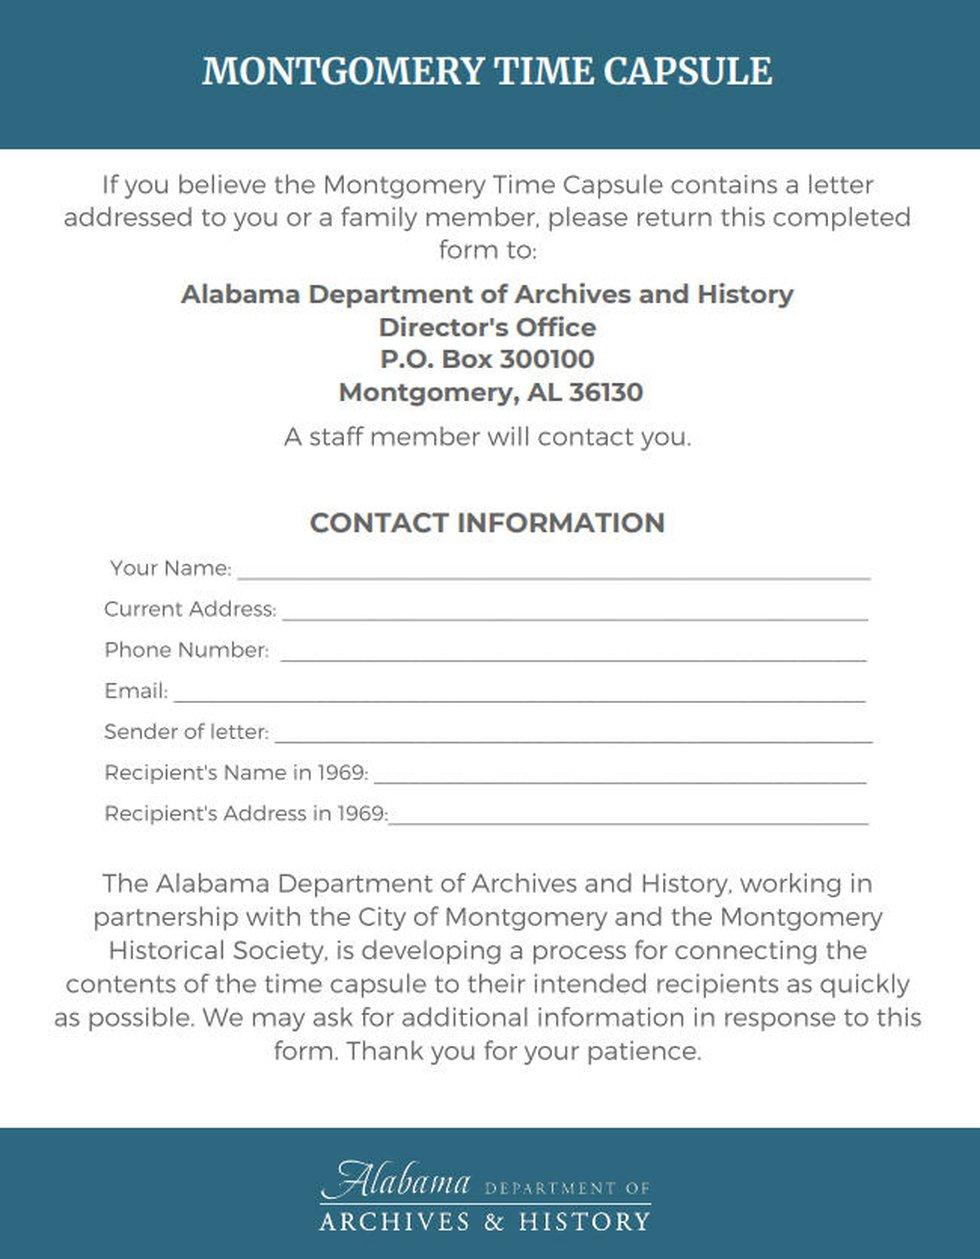 Alabama Dept. of Archives time capsule form